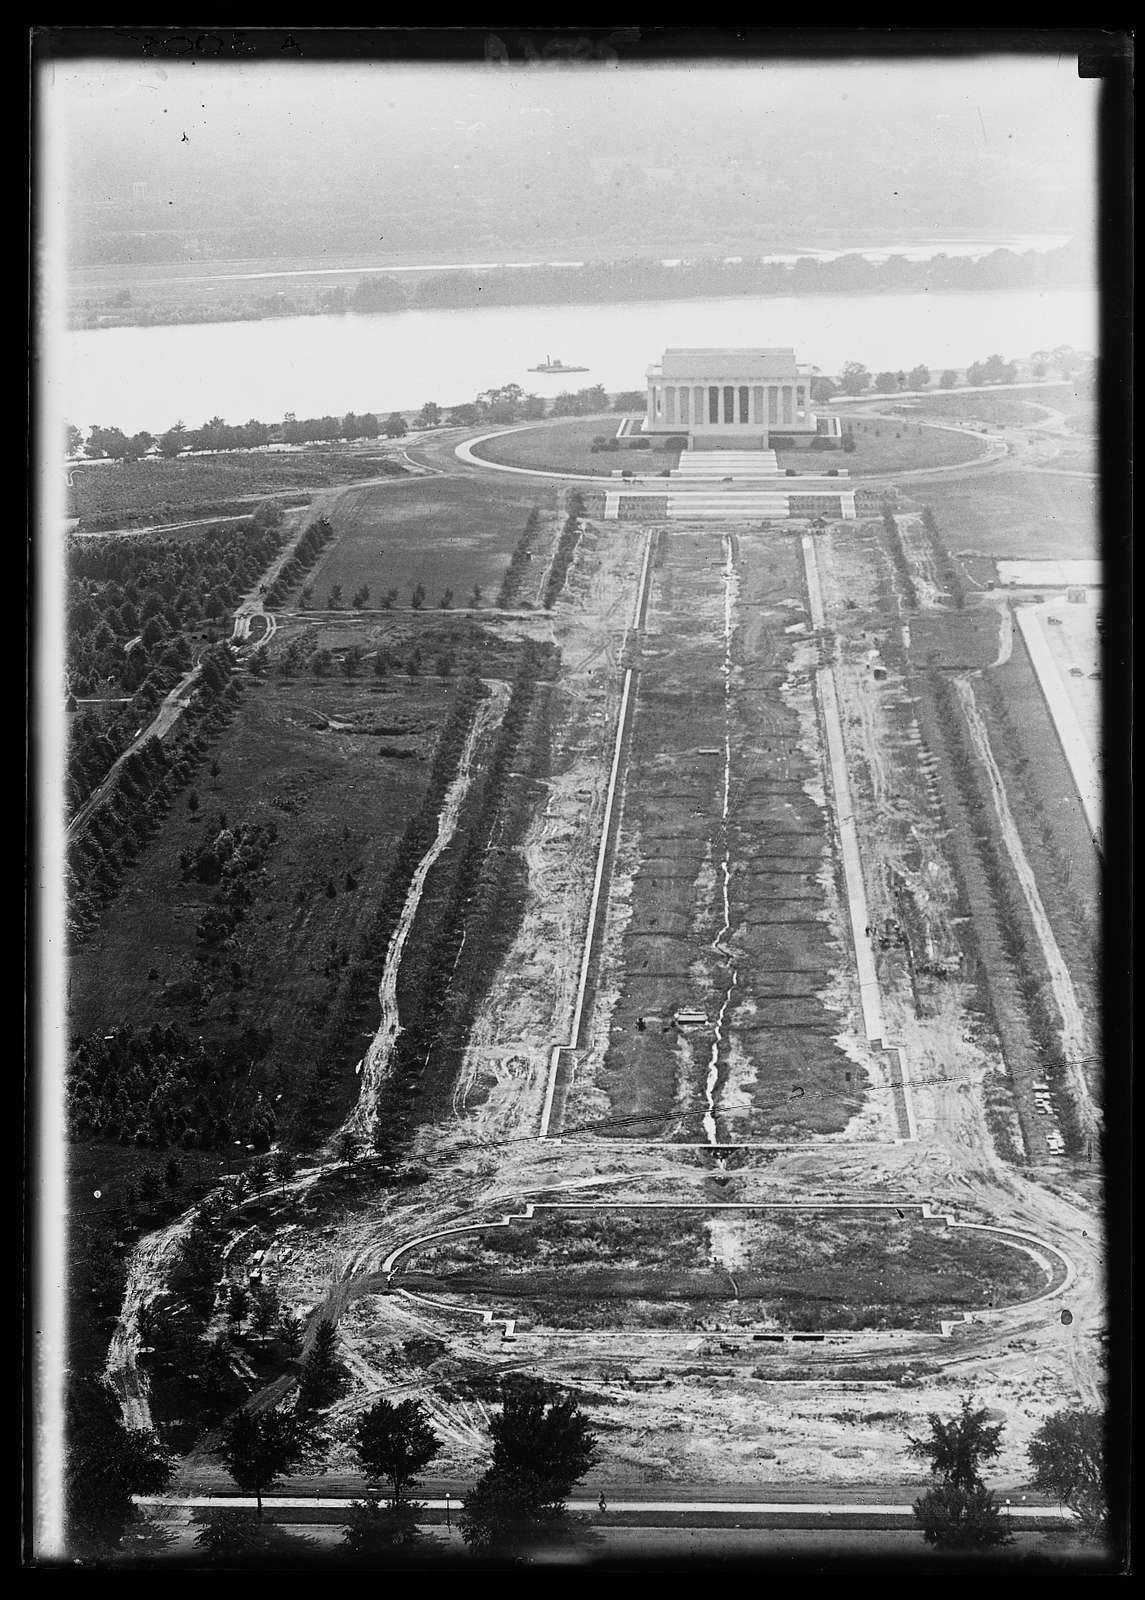 Aerial view of Lincoln Memorial, Washington, D.C.